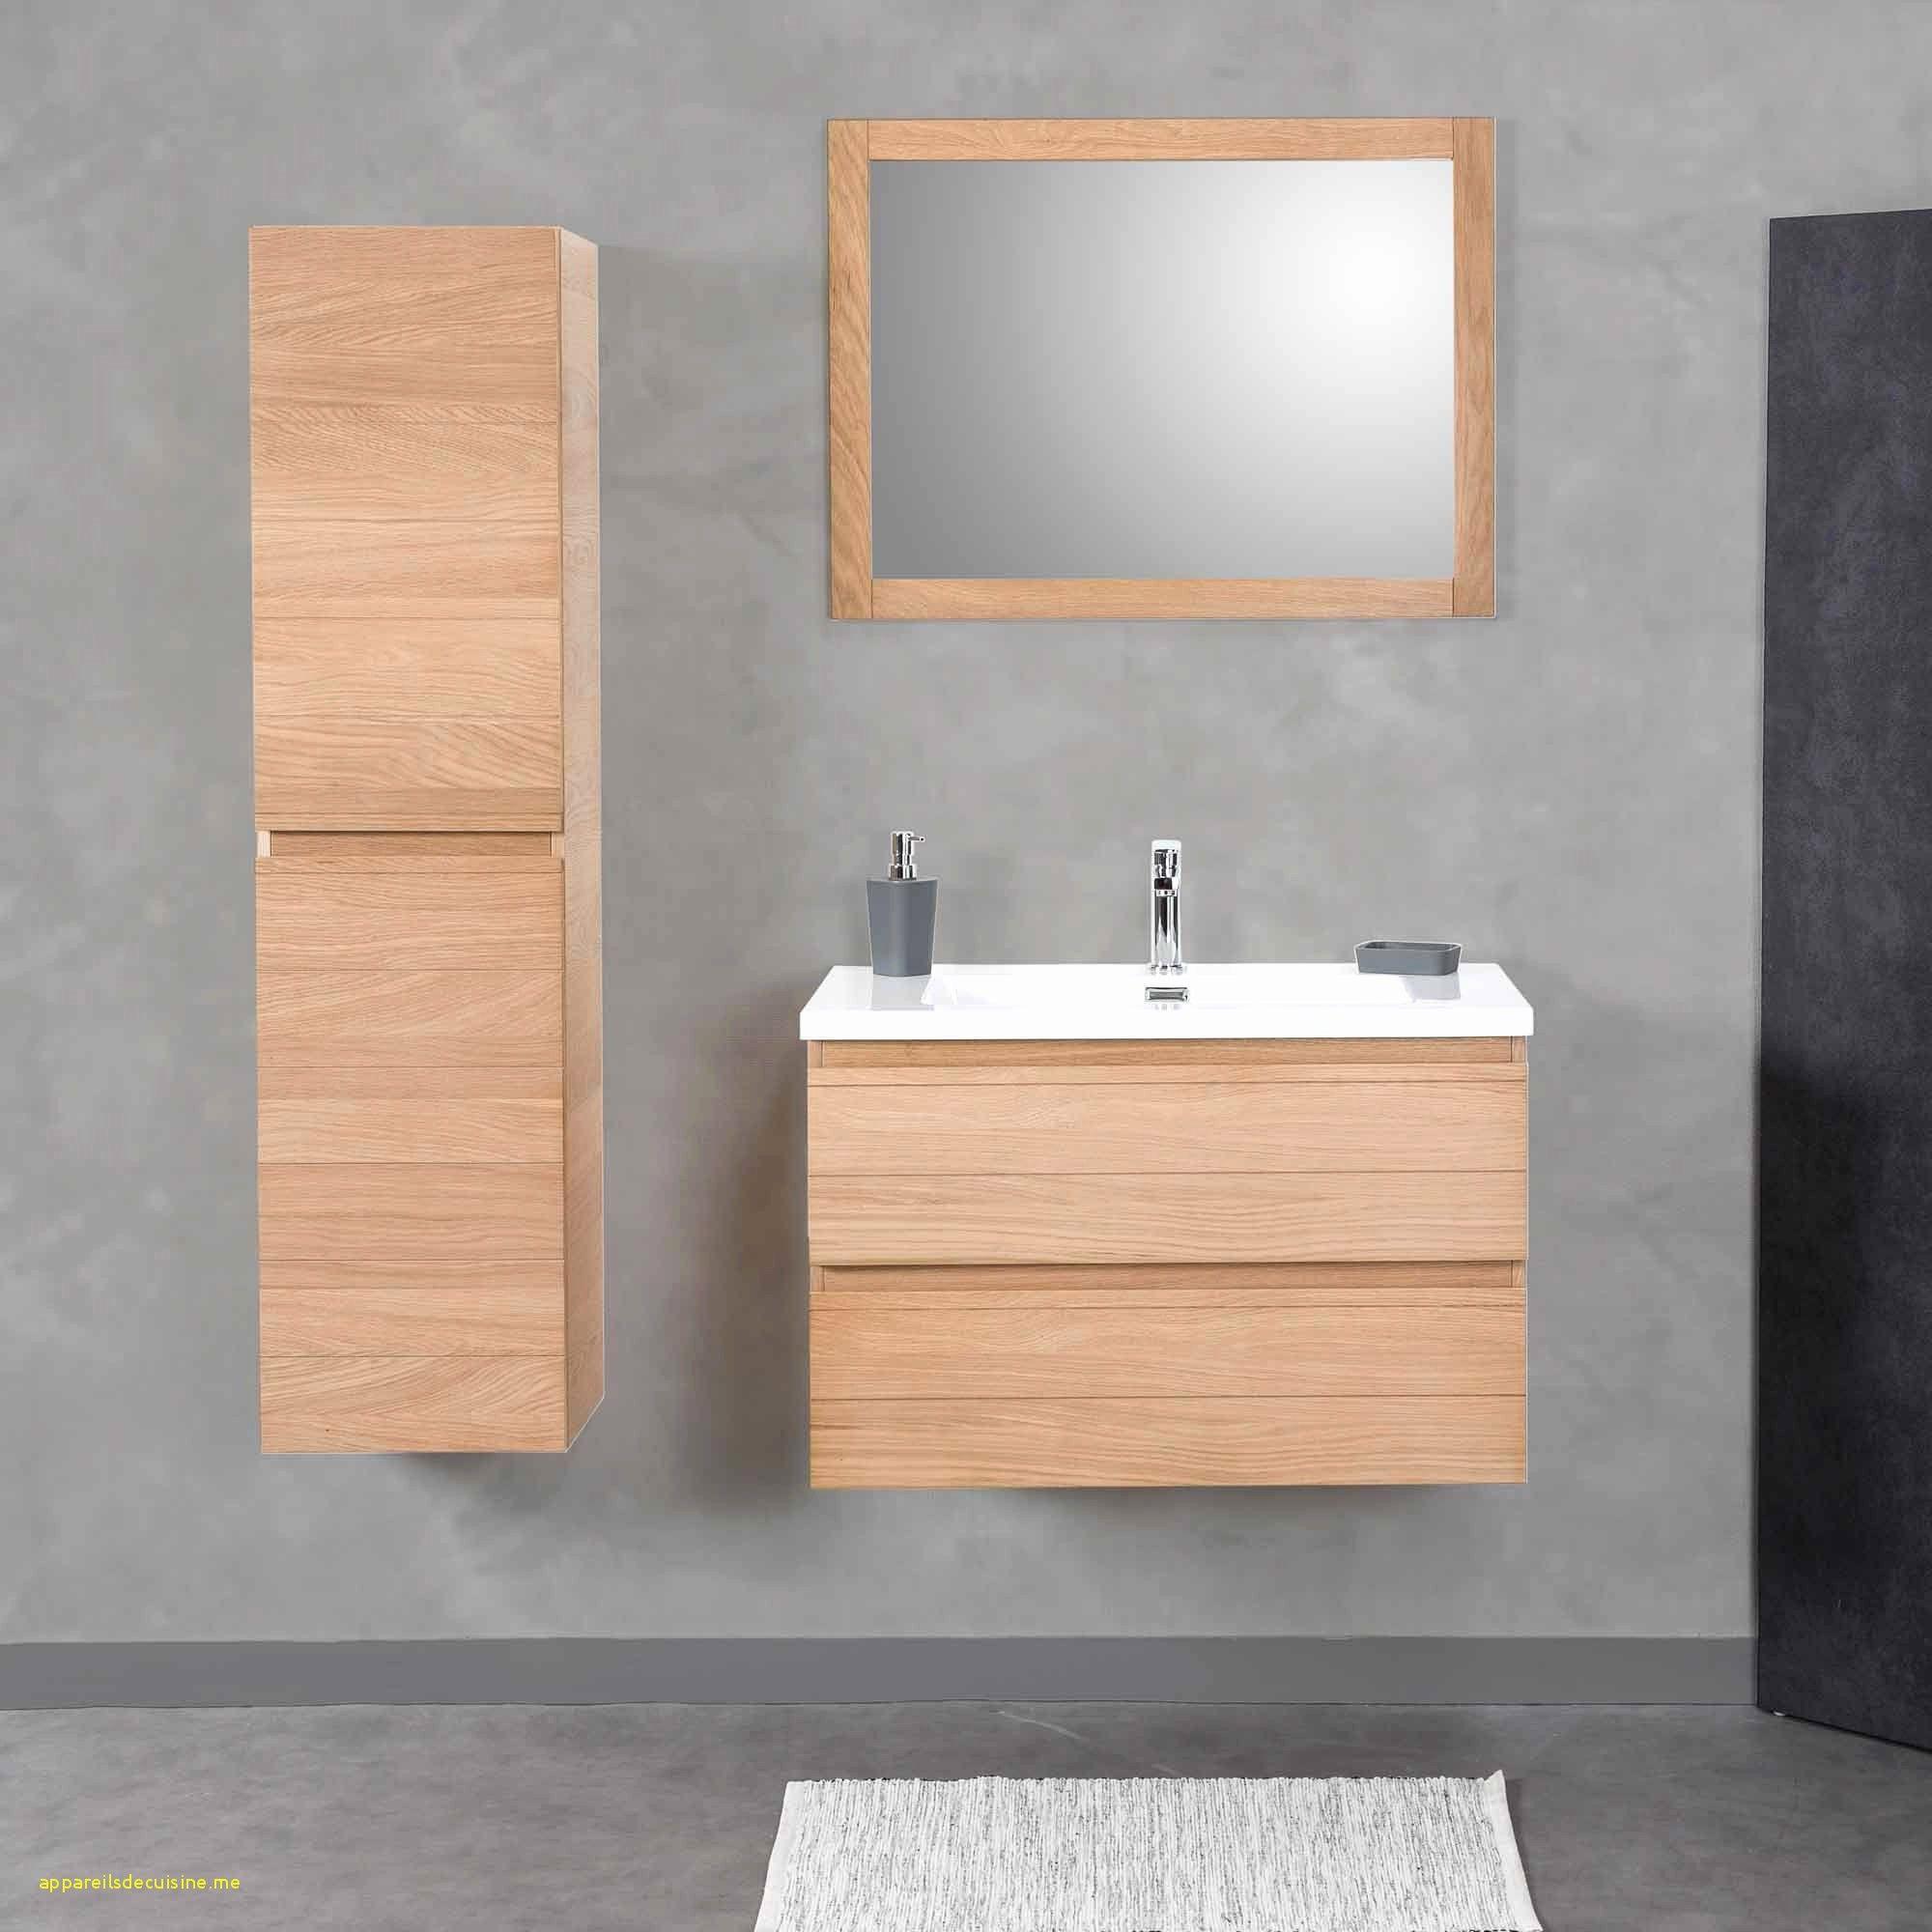 Beautiful Meuble Salle De Bain Profondeur 35 Cm Bathroom Furniture Bathroom Wood Bathroom